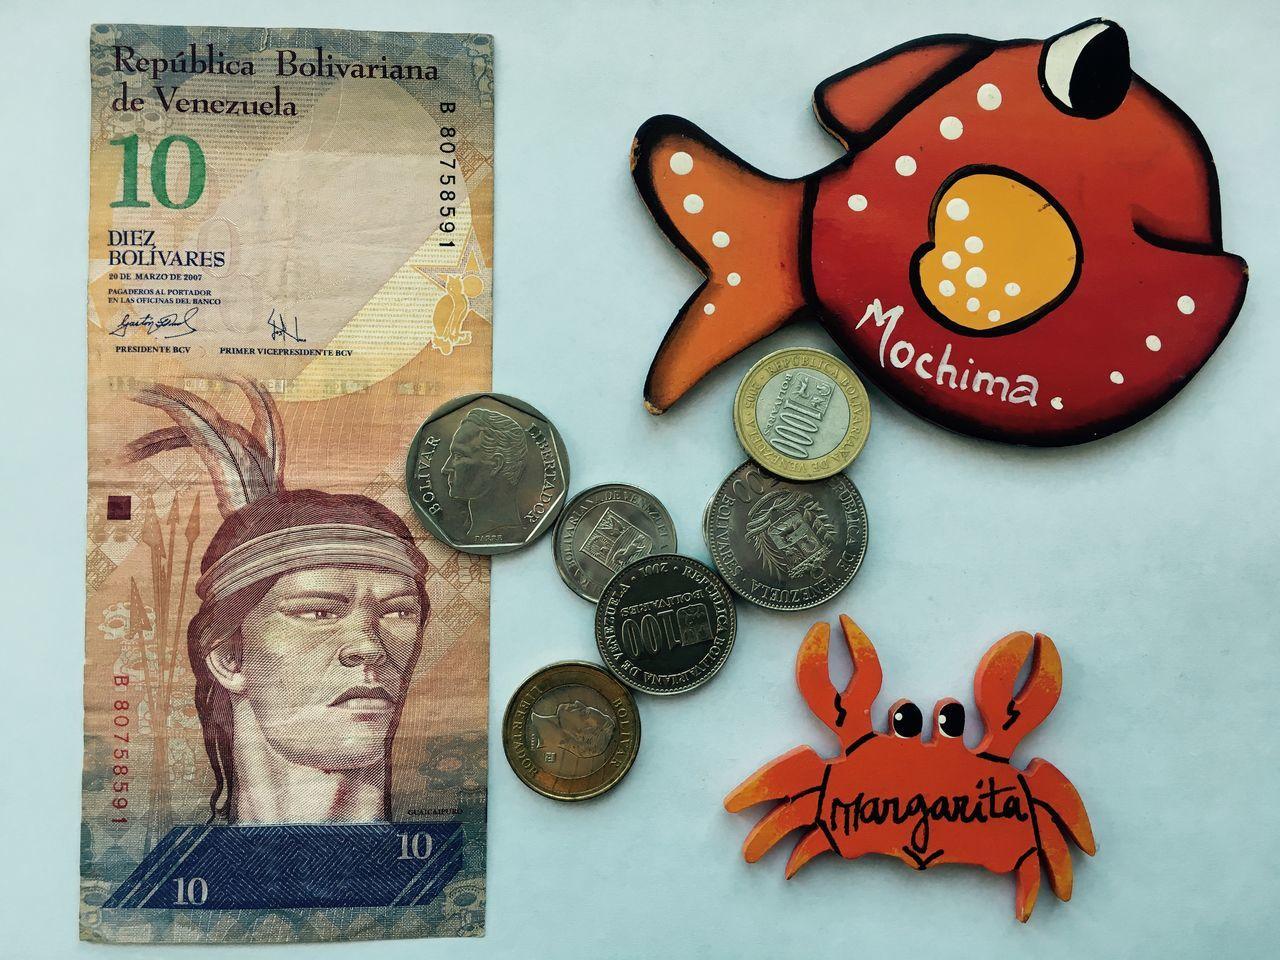 Banknote Bolivar Bolivares Coins Currency Isla Margarita Magnets Margarita Margarita Island Margarita, Venezuela Mochima Money No People Souvenir Travel Photography Vacation Venezuela Venezuela Money